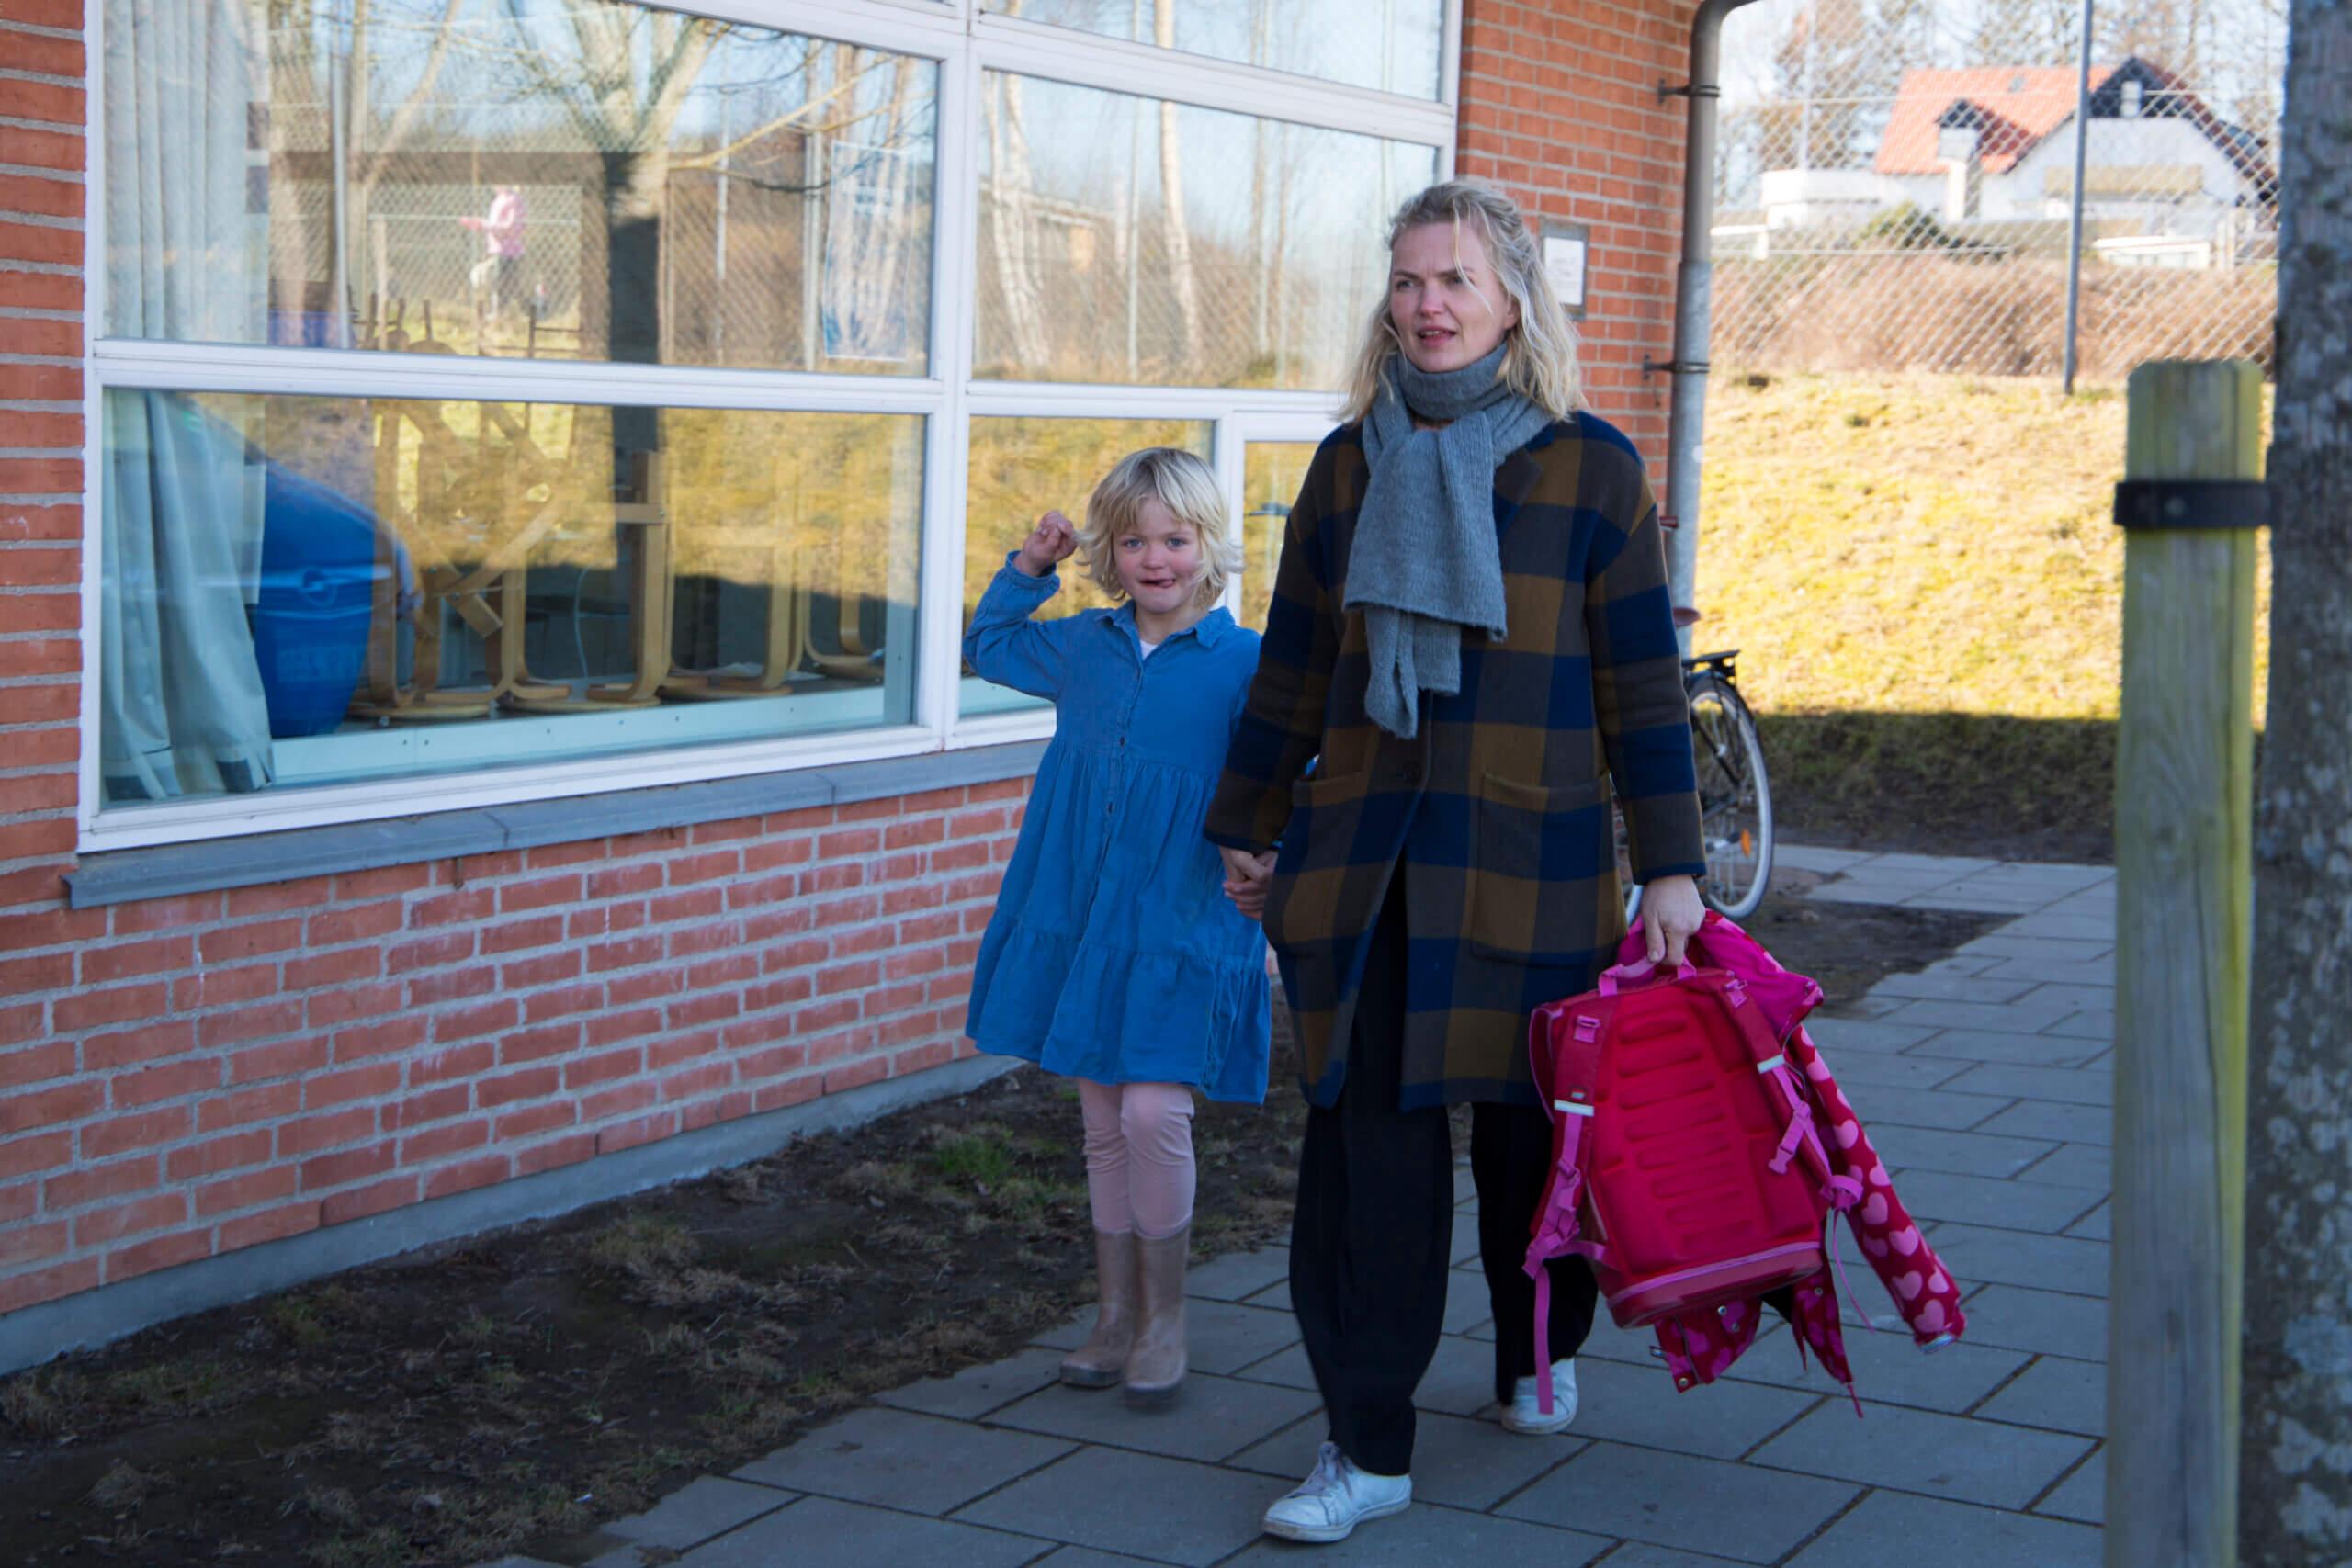 Datter og mor på vej i skole